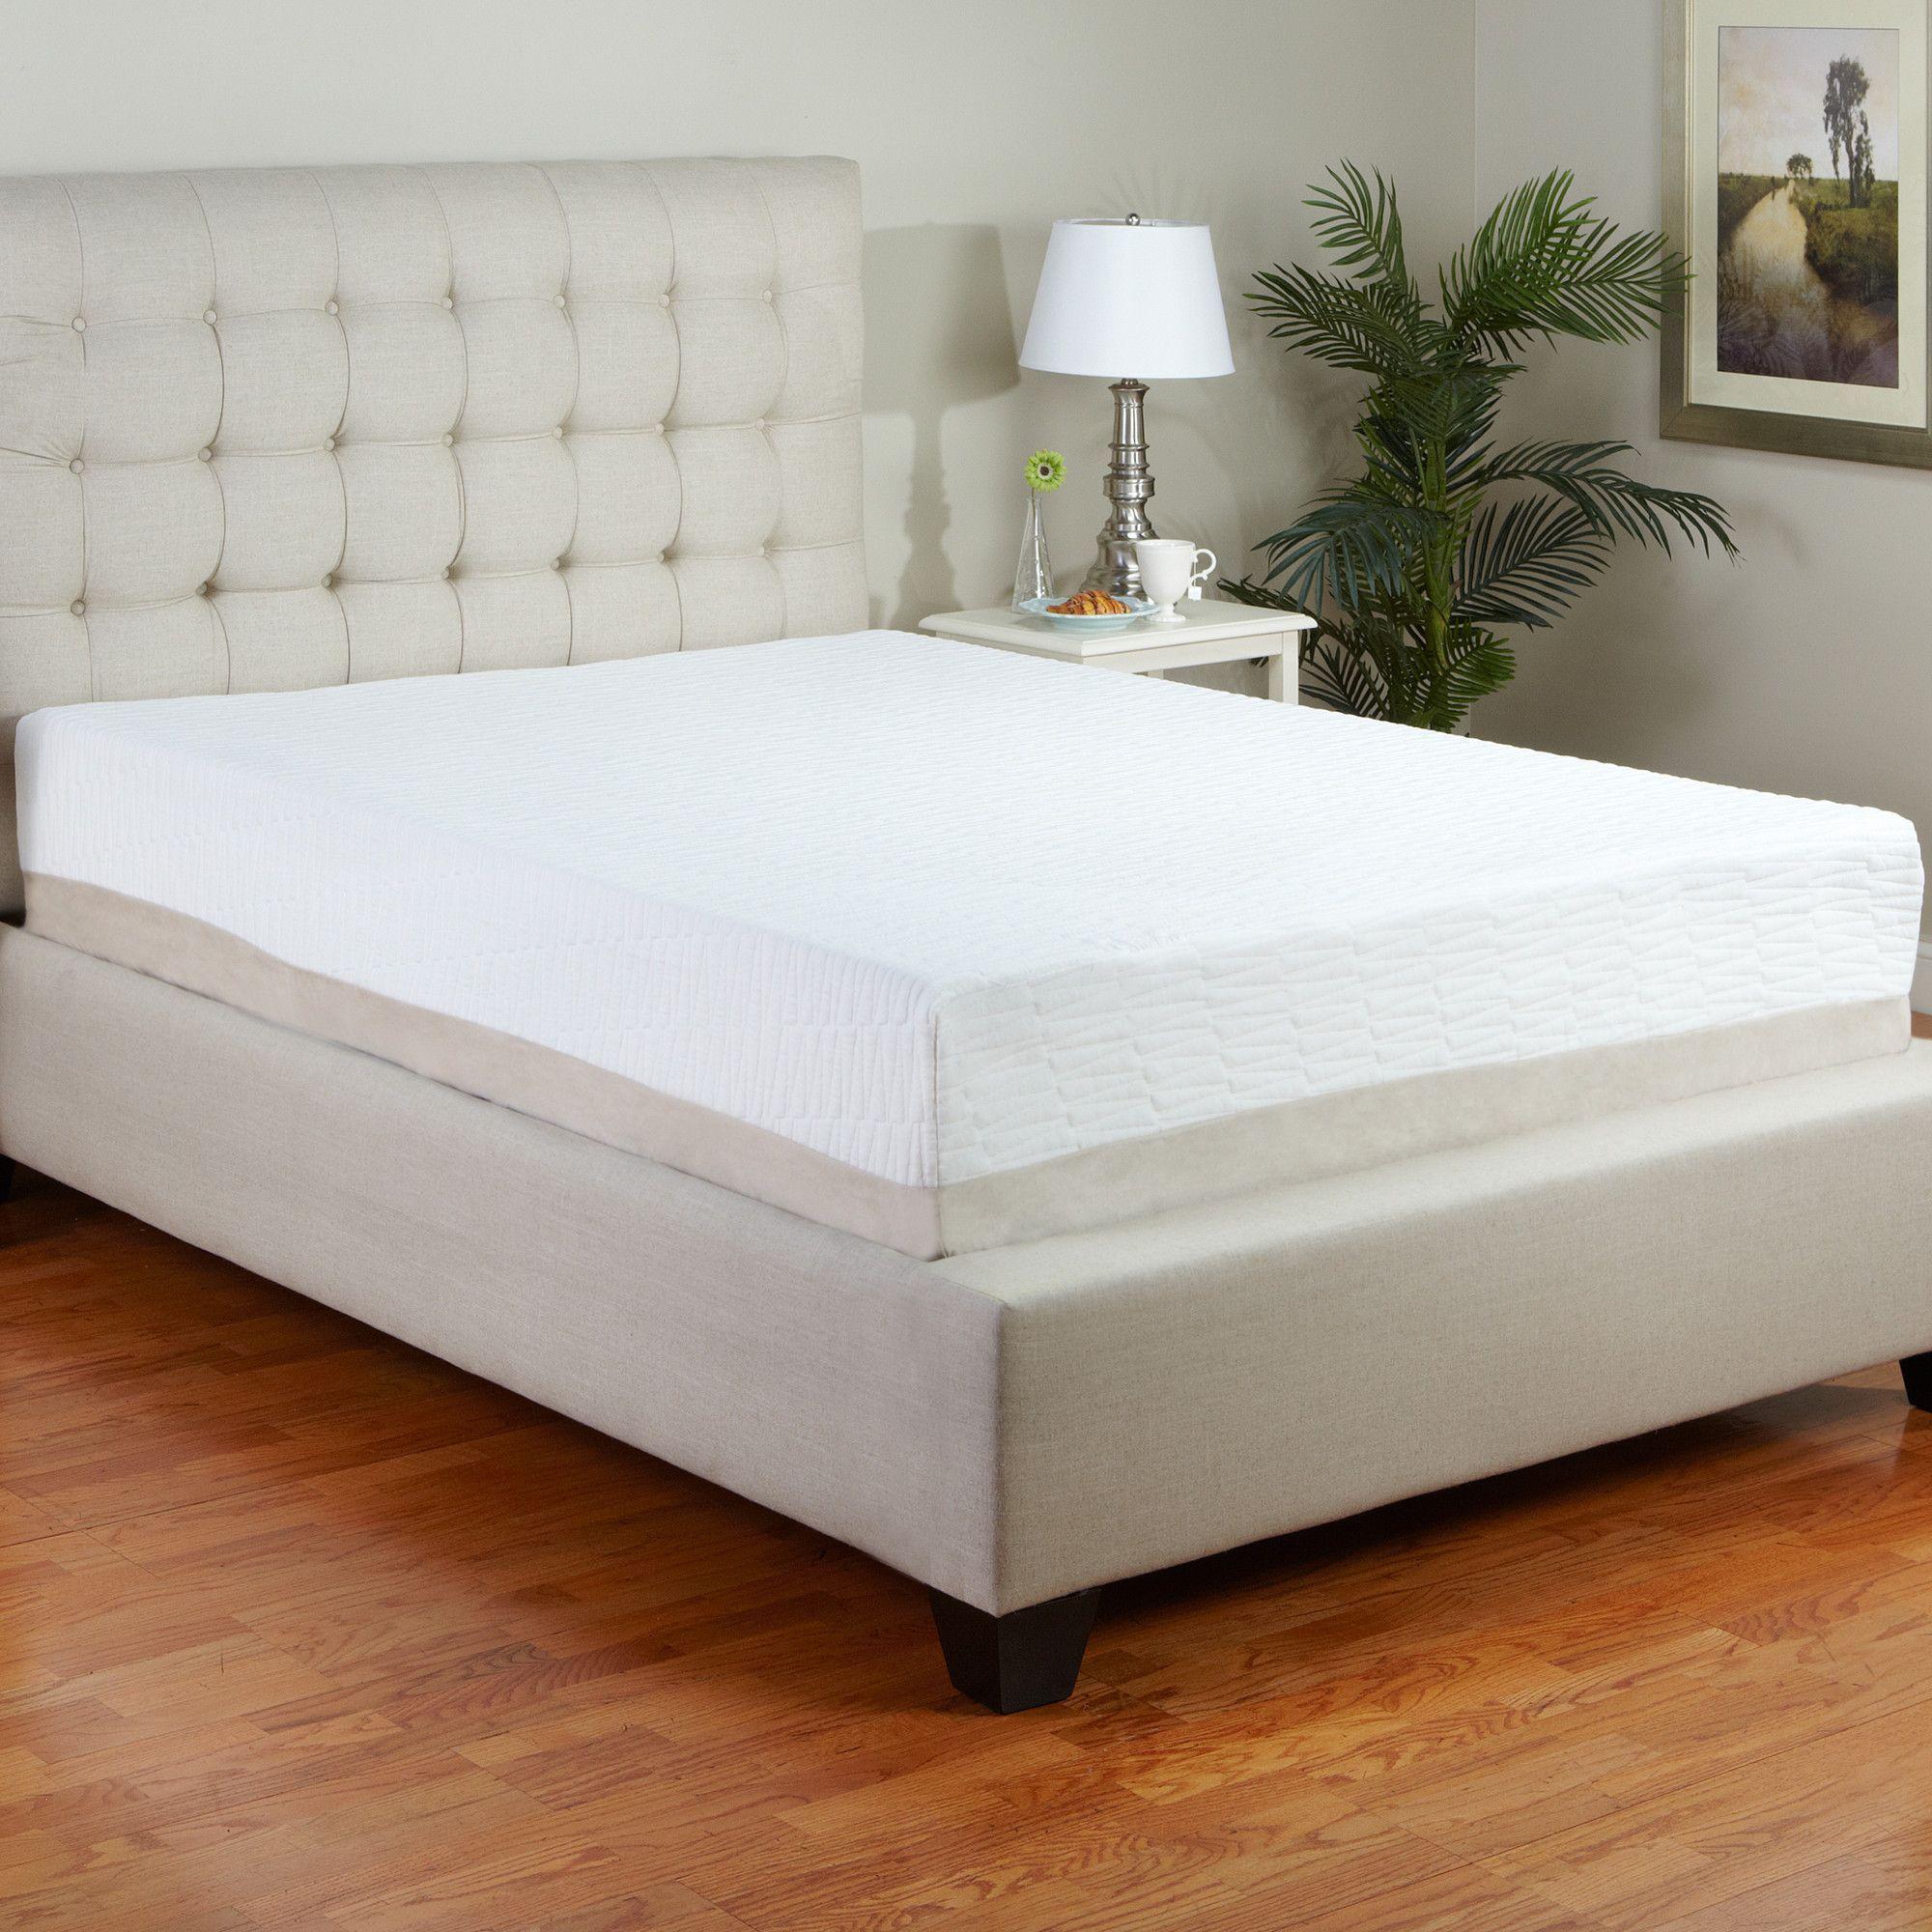 latex buy foam now mattress pureflex pureflexr only from a online